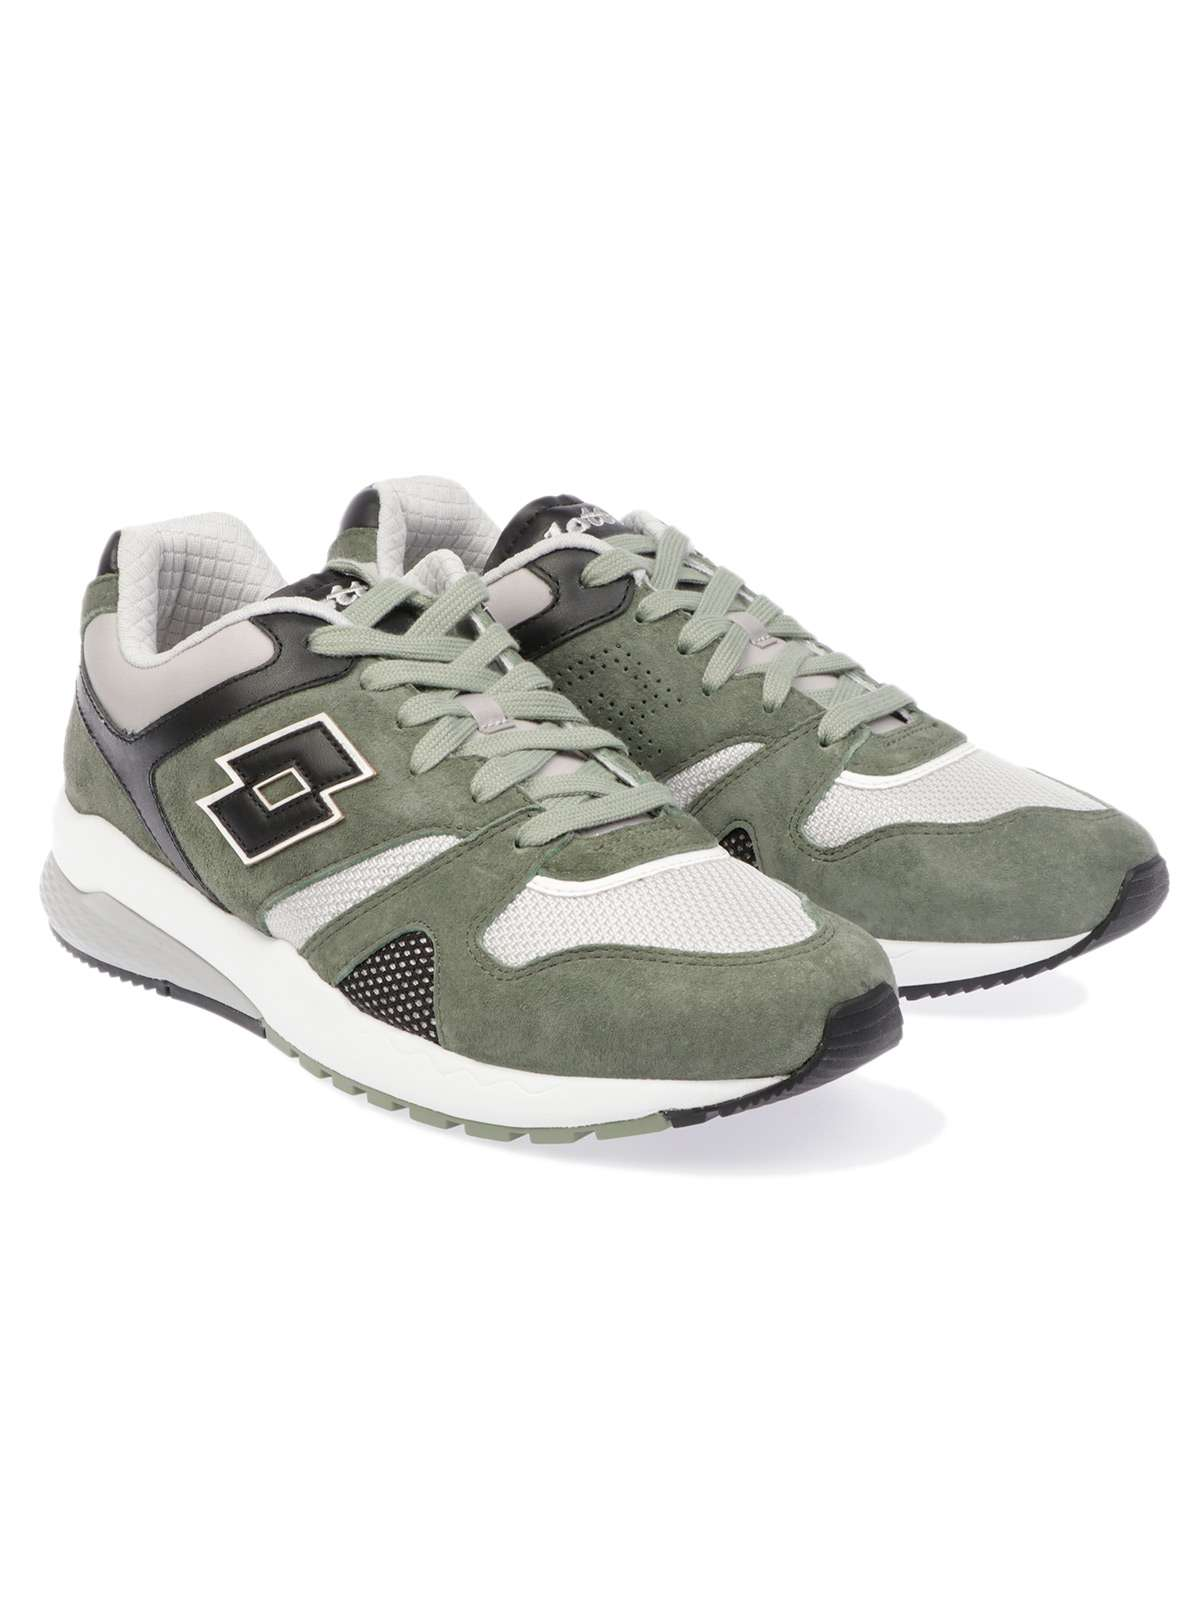 https://www.parmax.com/media/catalog/product/a/i/AI-outlet_parmax-scarpe-uomo-Lotto-211149-B.jpg